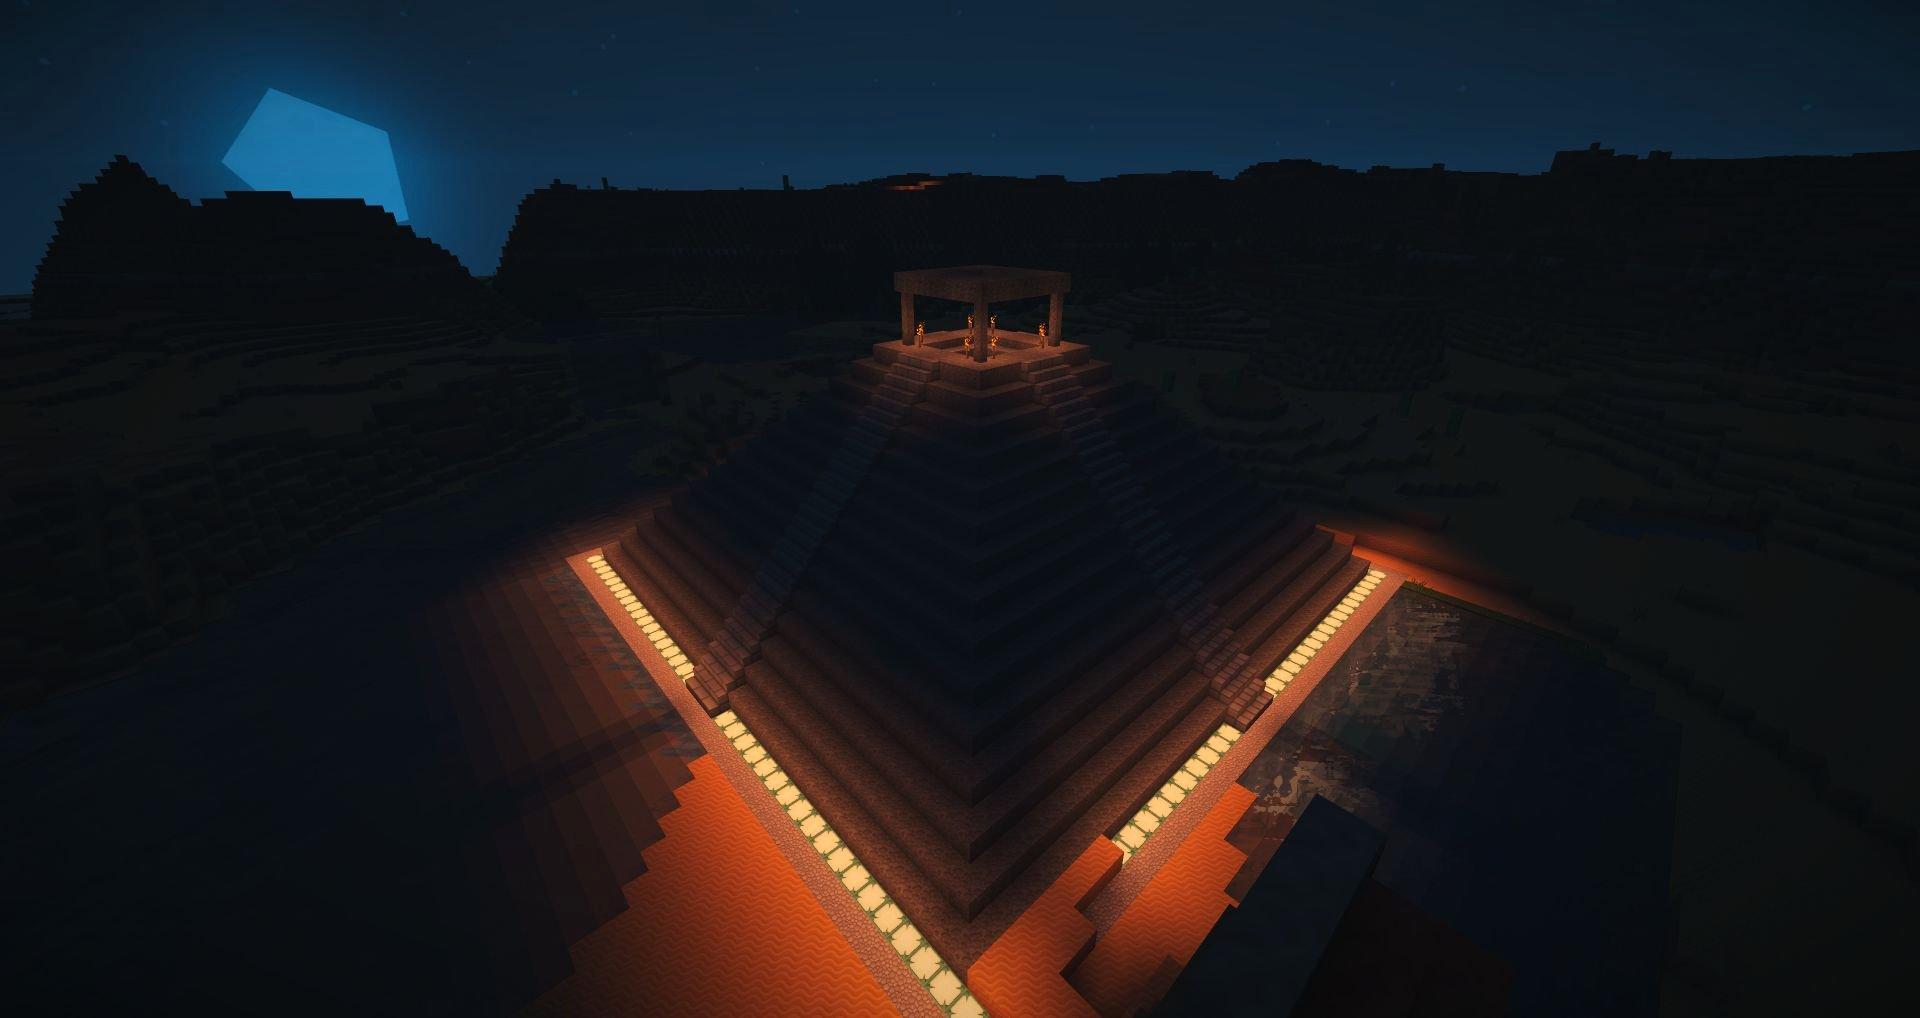 Mayan Temple after dark